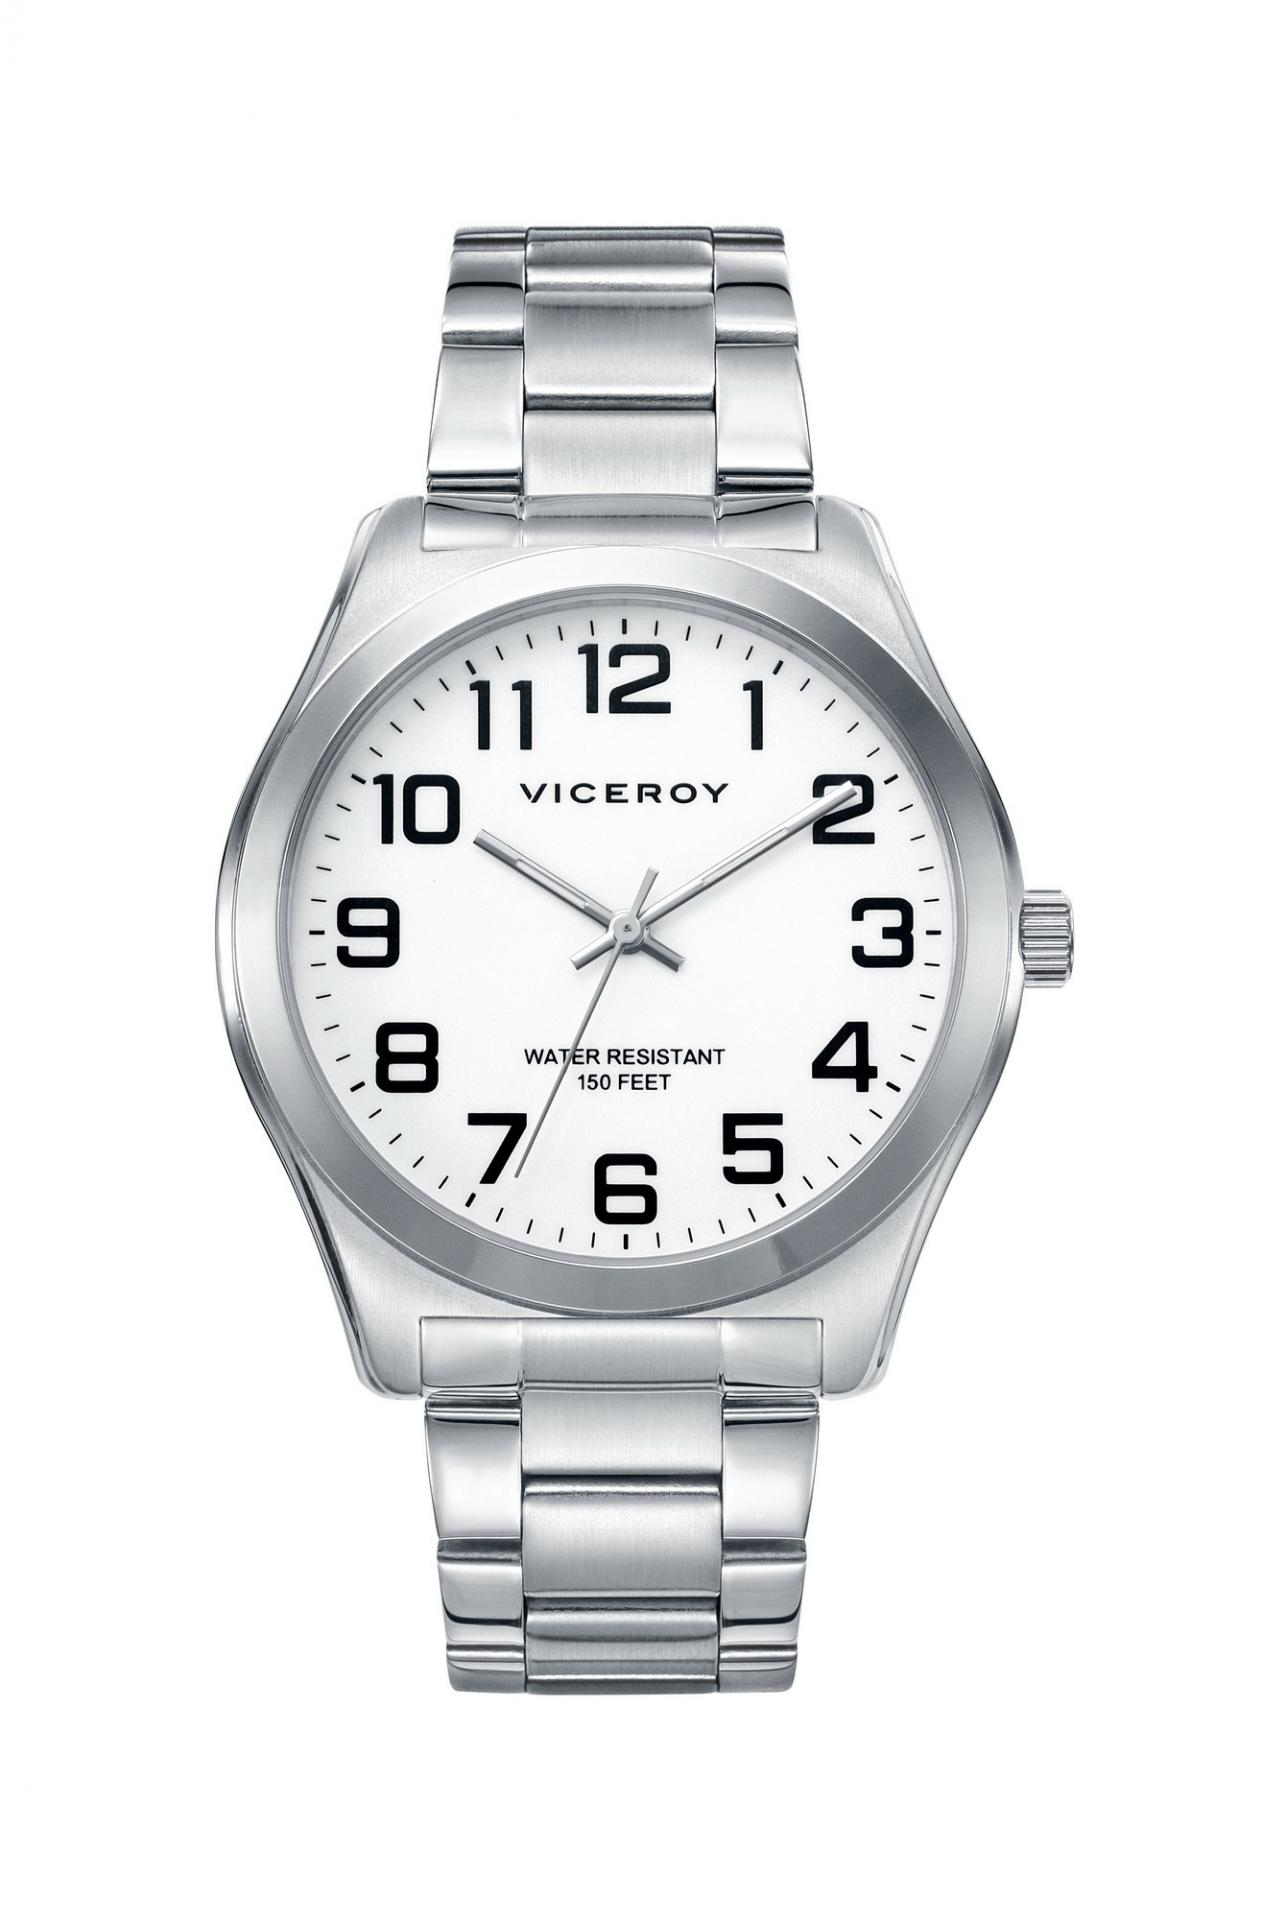 Reloj Viceroy Hombre Ref. 40513-04